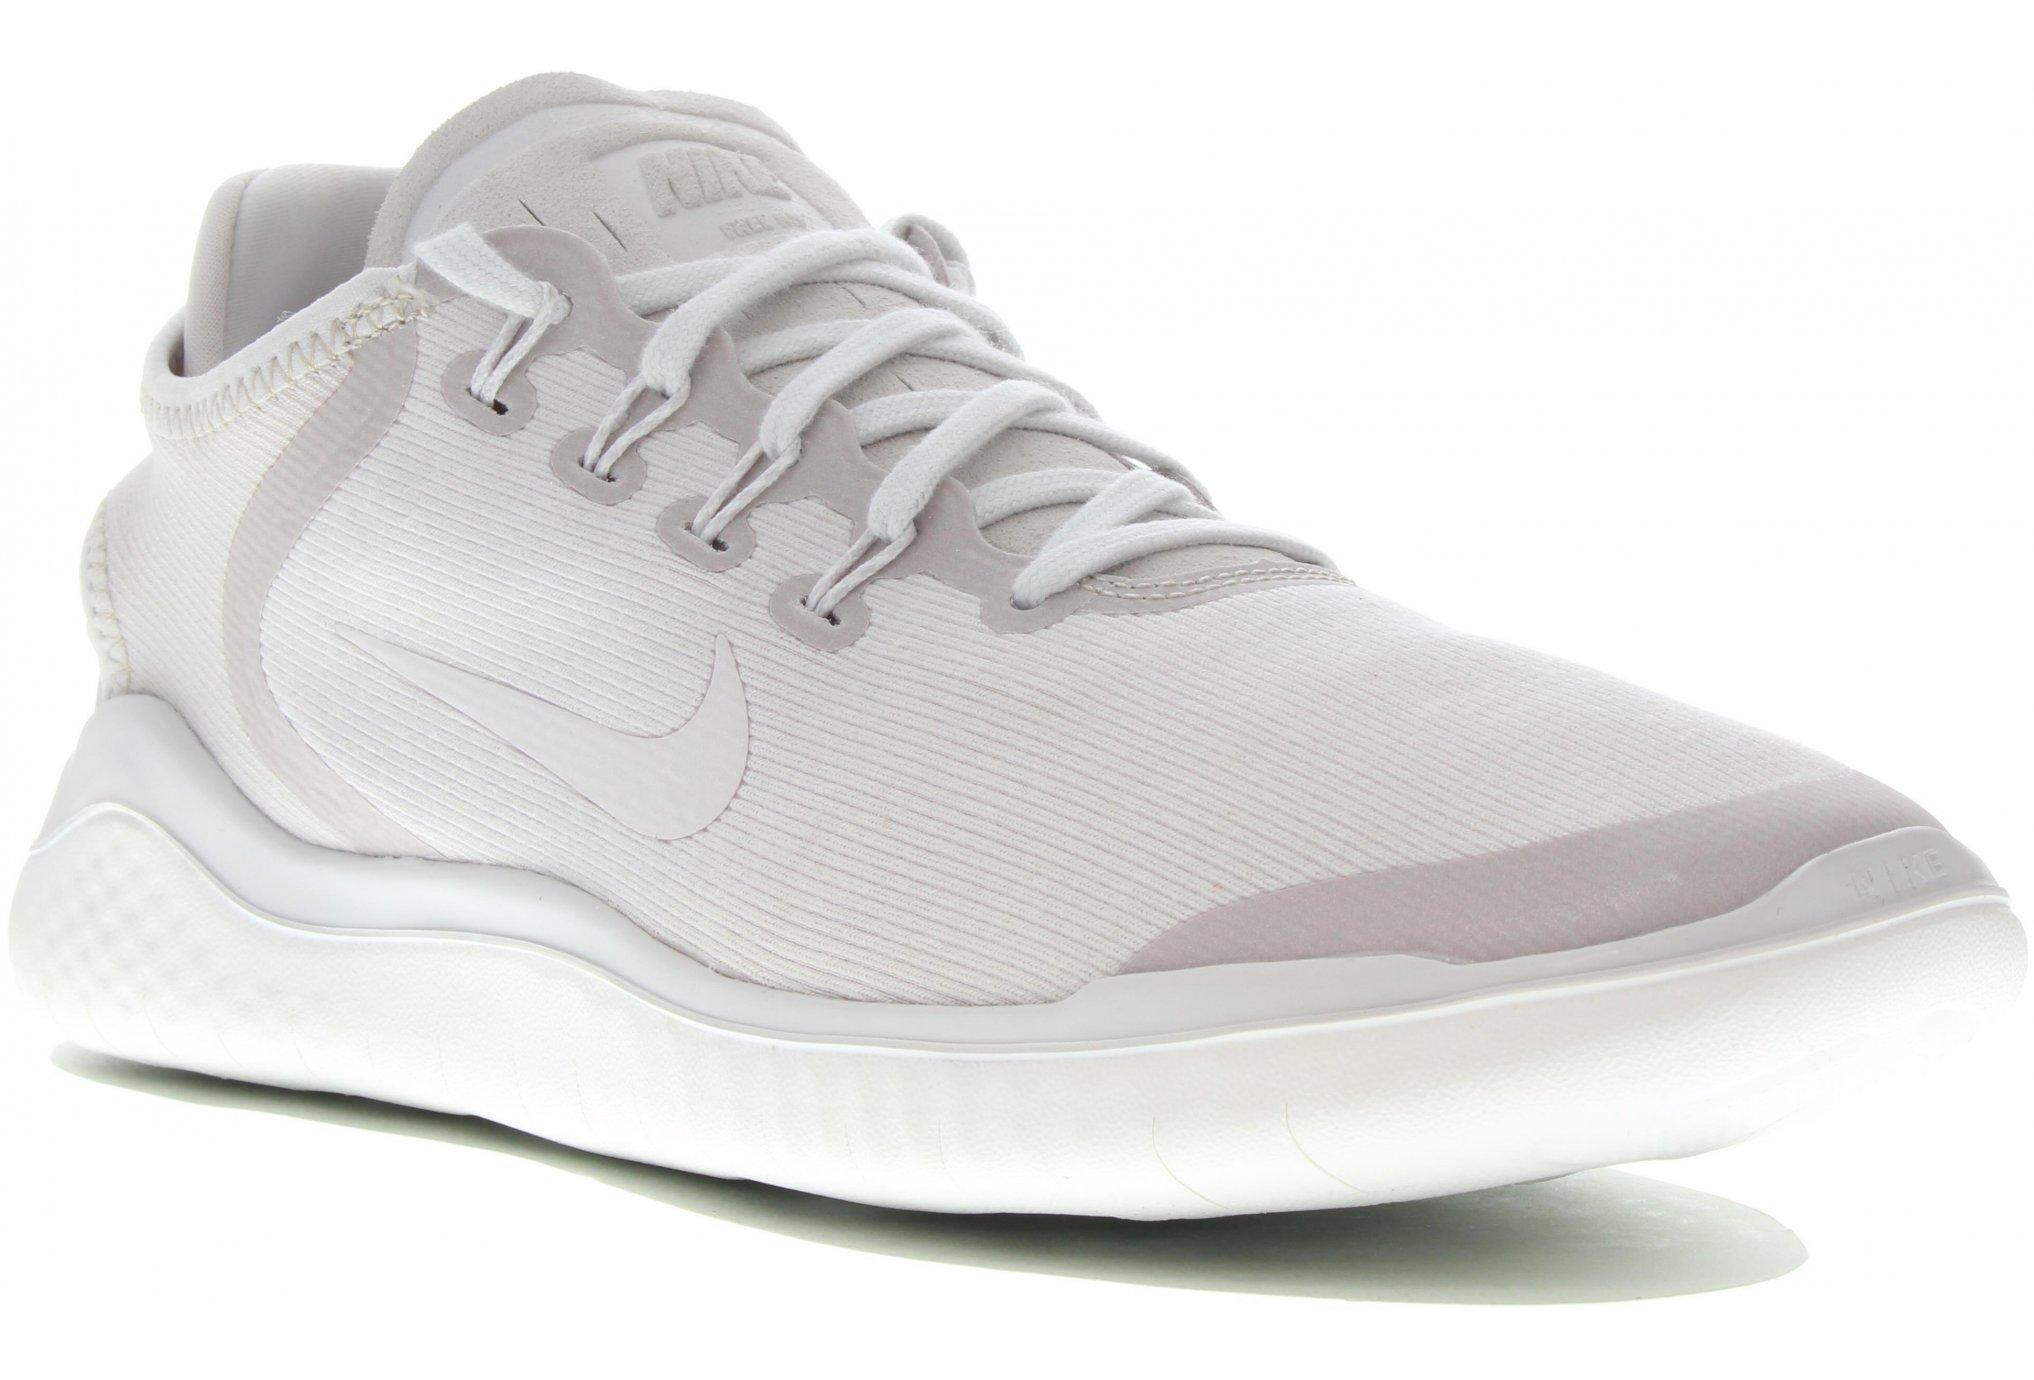 Nike Free RN Sun W Diététique Chaussures femme